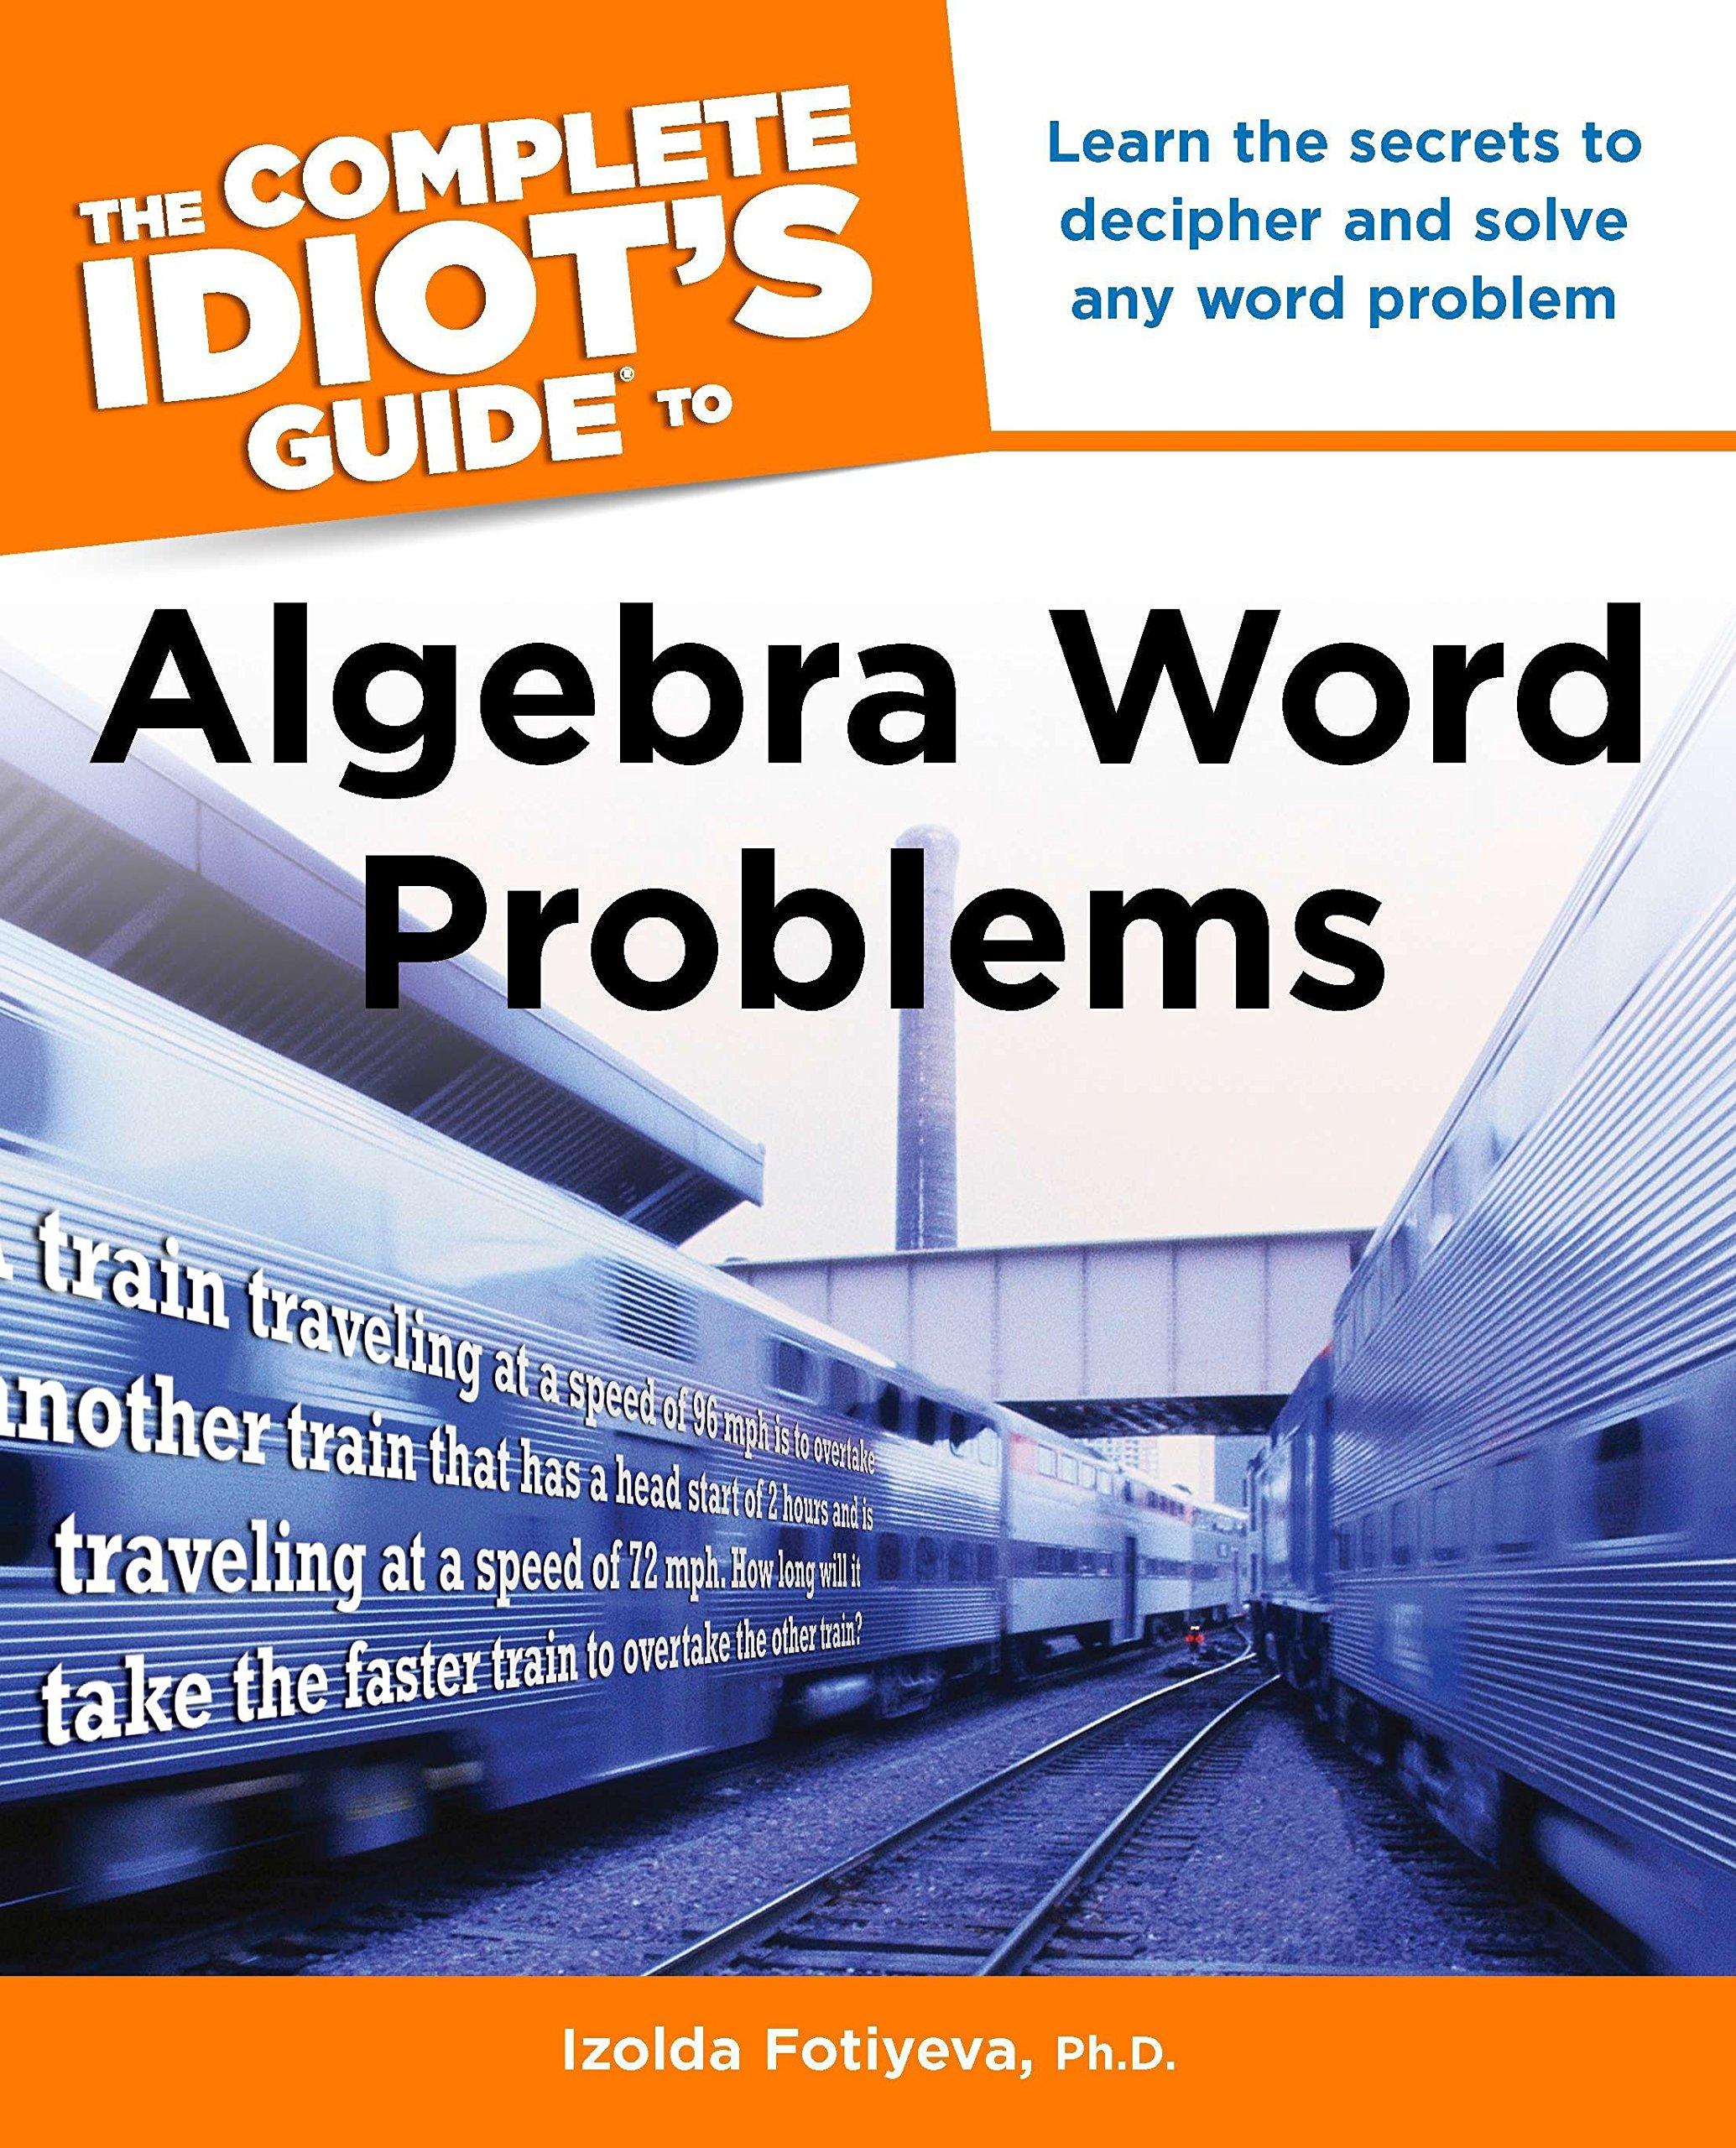 The Complete Idiot's Guide to Algebra Word Problems: Izolda Fotiyeva:  9781615640379: Amazon.com: Books